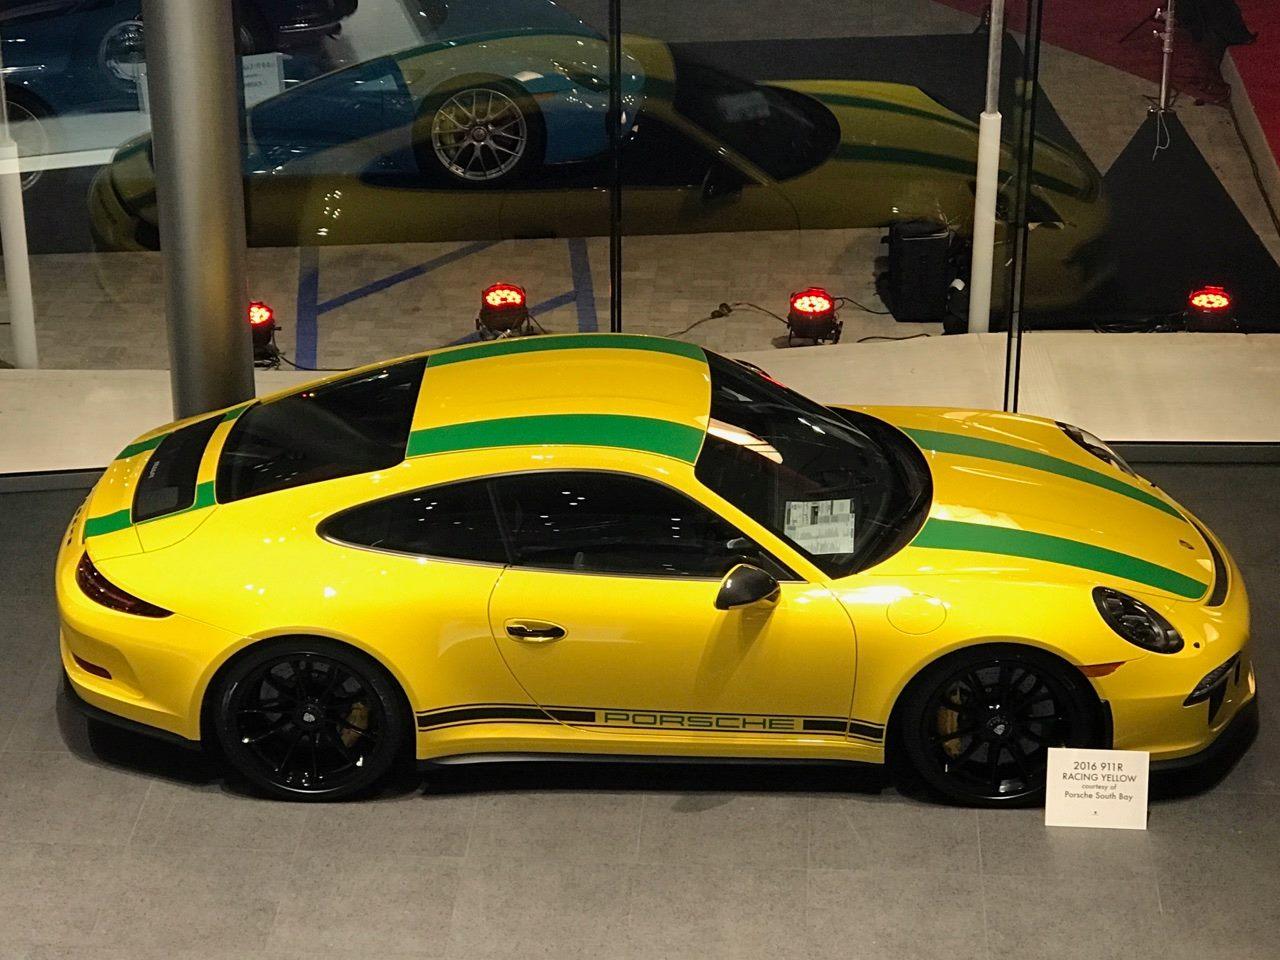 Porsche Vintage Seats >> Special Racing Yellow Porsche 911 R - Tribute to Ayrton Senna - GTspirit